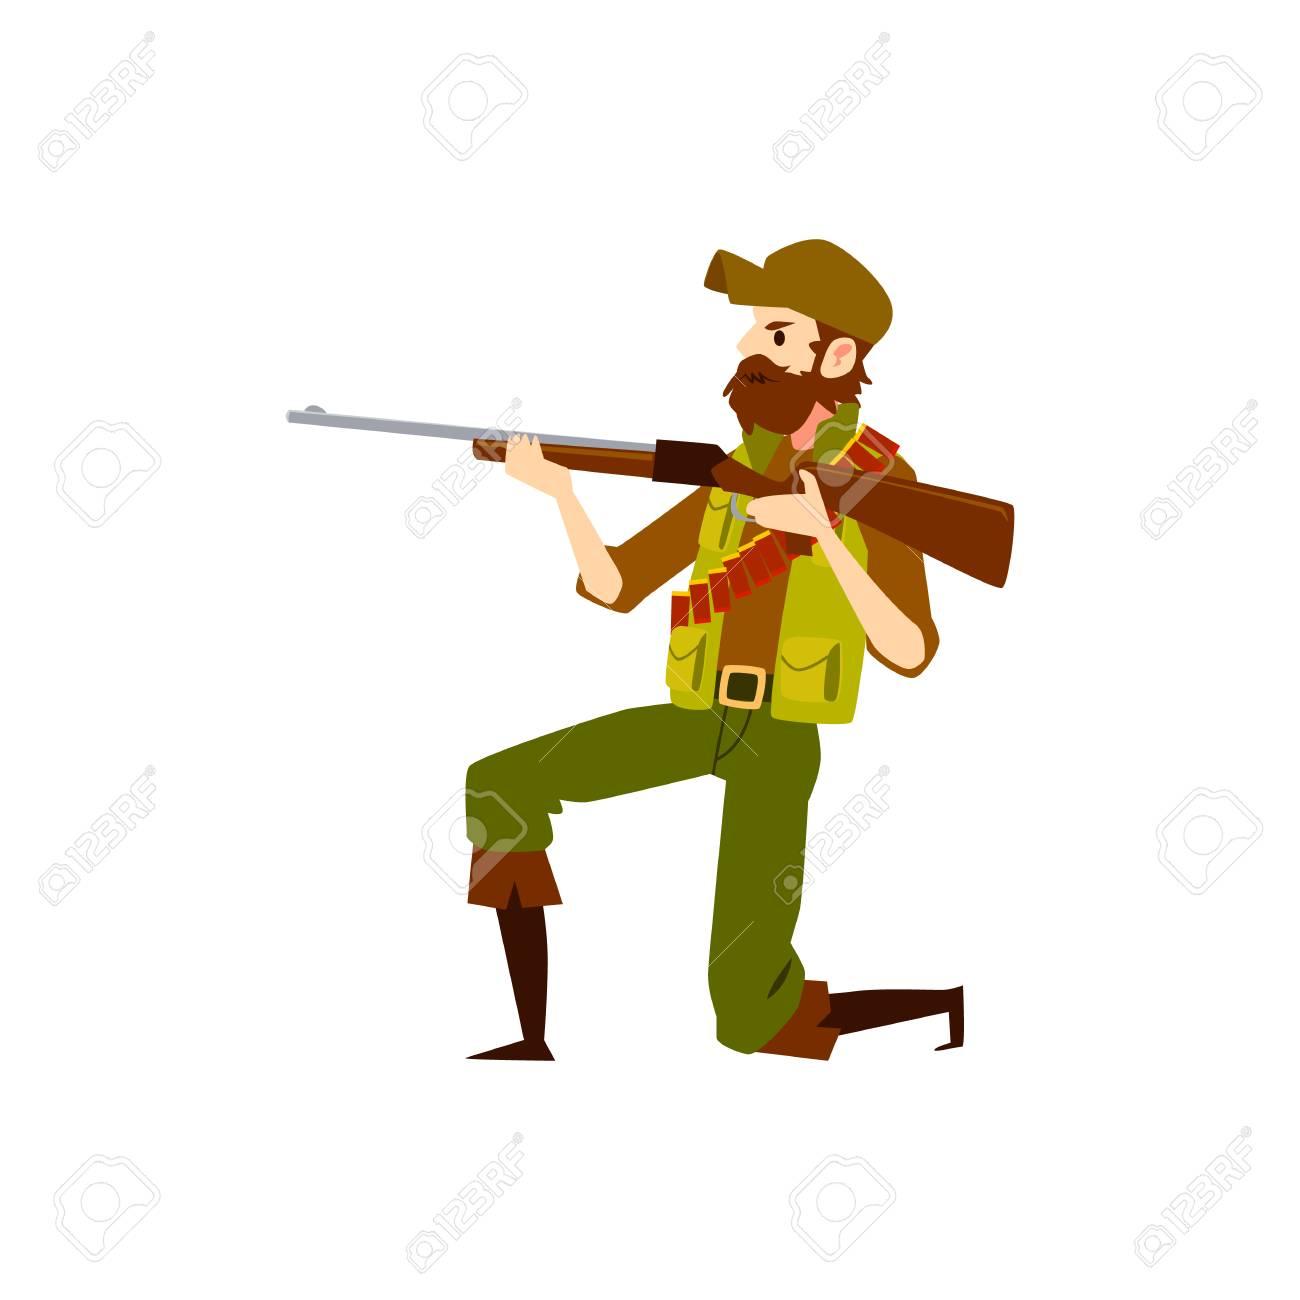 Hunter Man With Rifle Gun Aiming To Shoot Male Cartoon Character